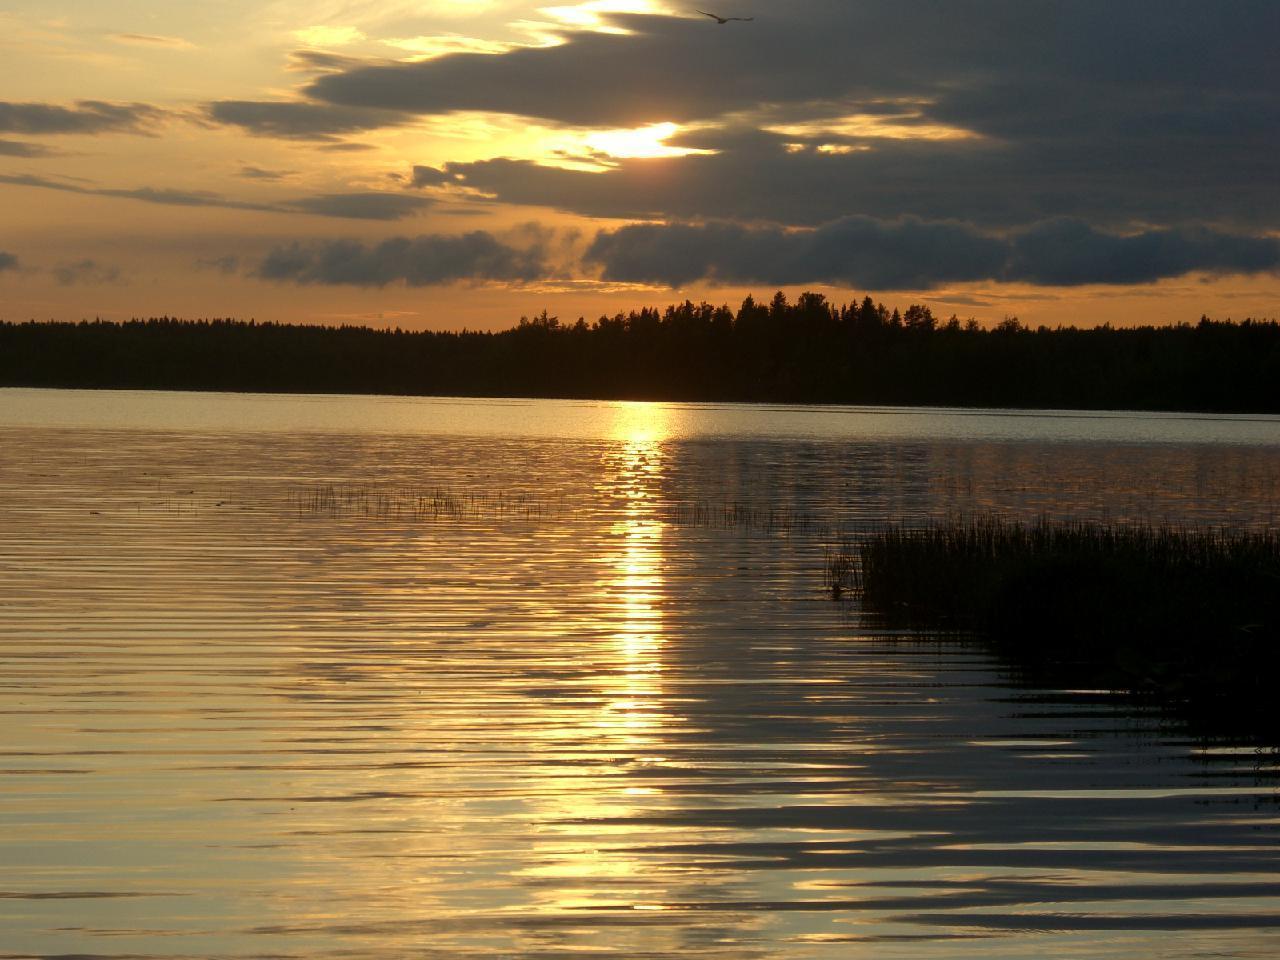 Ferienhaus - Mökki mit Sauna direkt am See  in Mouhijärvi-Sastamala (1707905), Mouhijärvi, , Westfinnland, Finnland, Bild 14